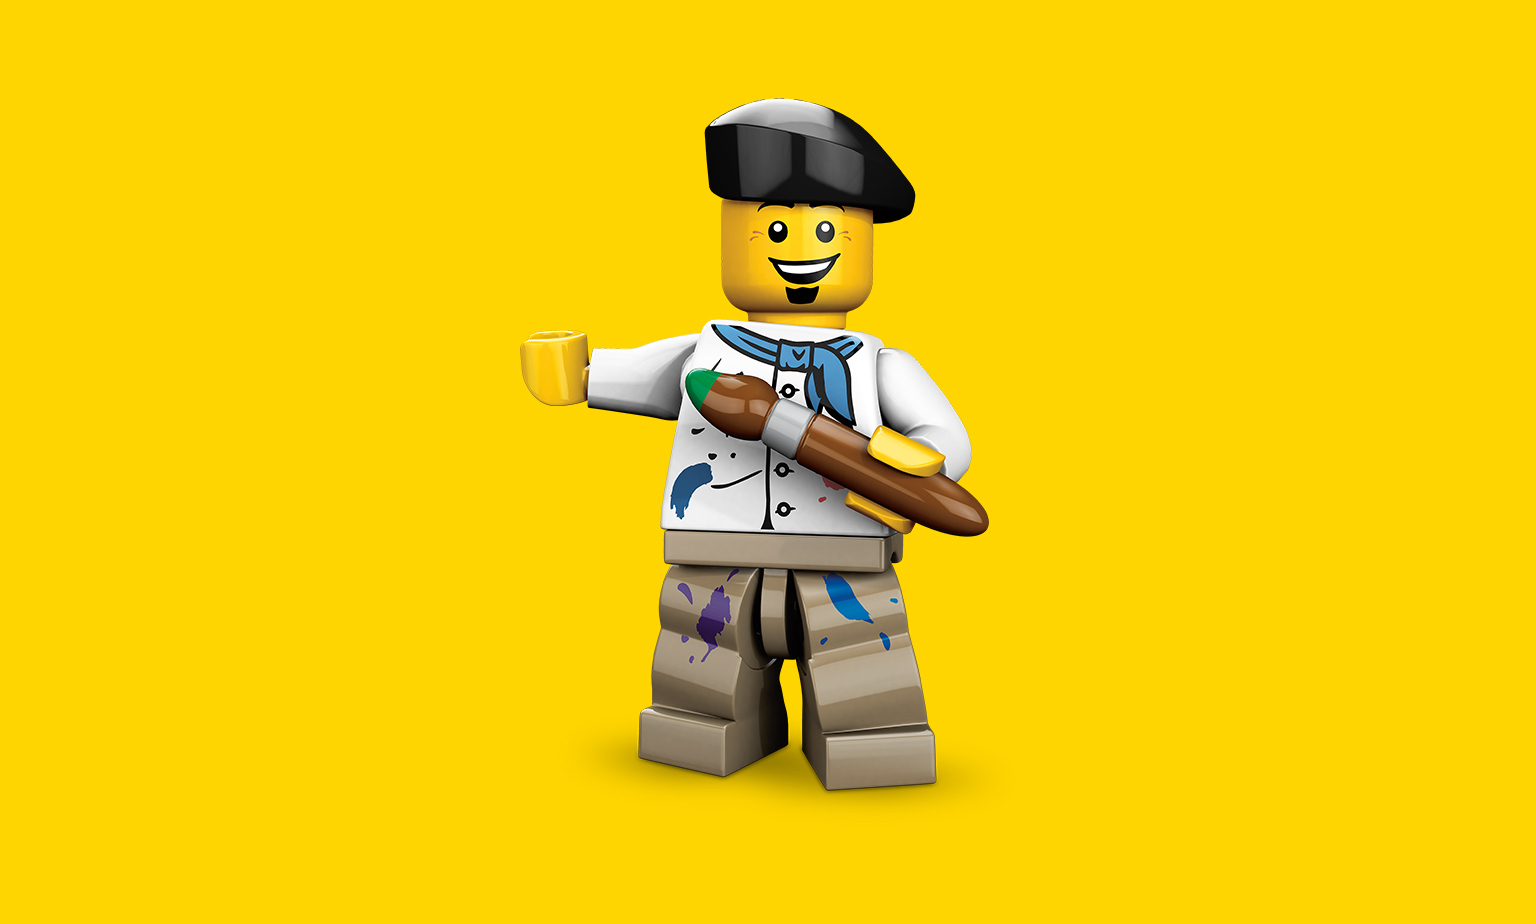 Authorised LEGO Sale